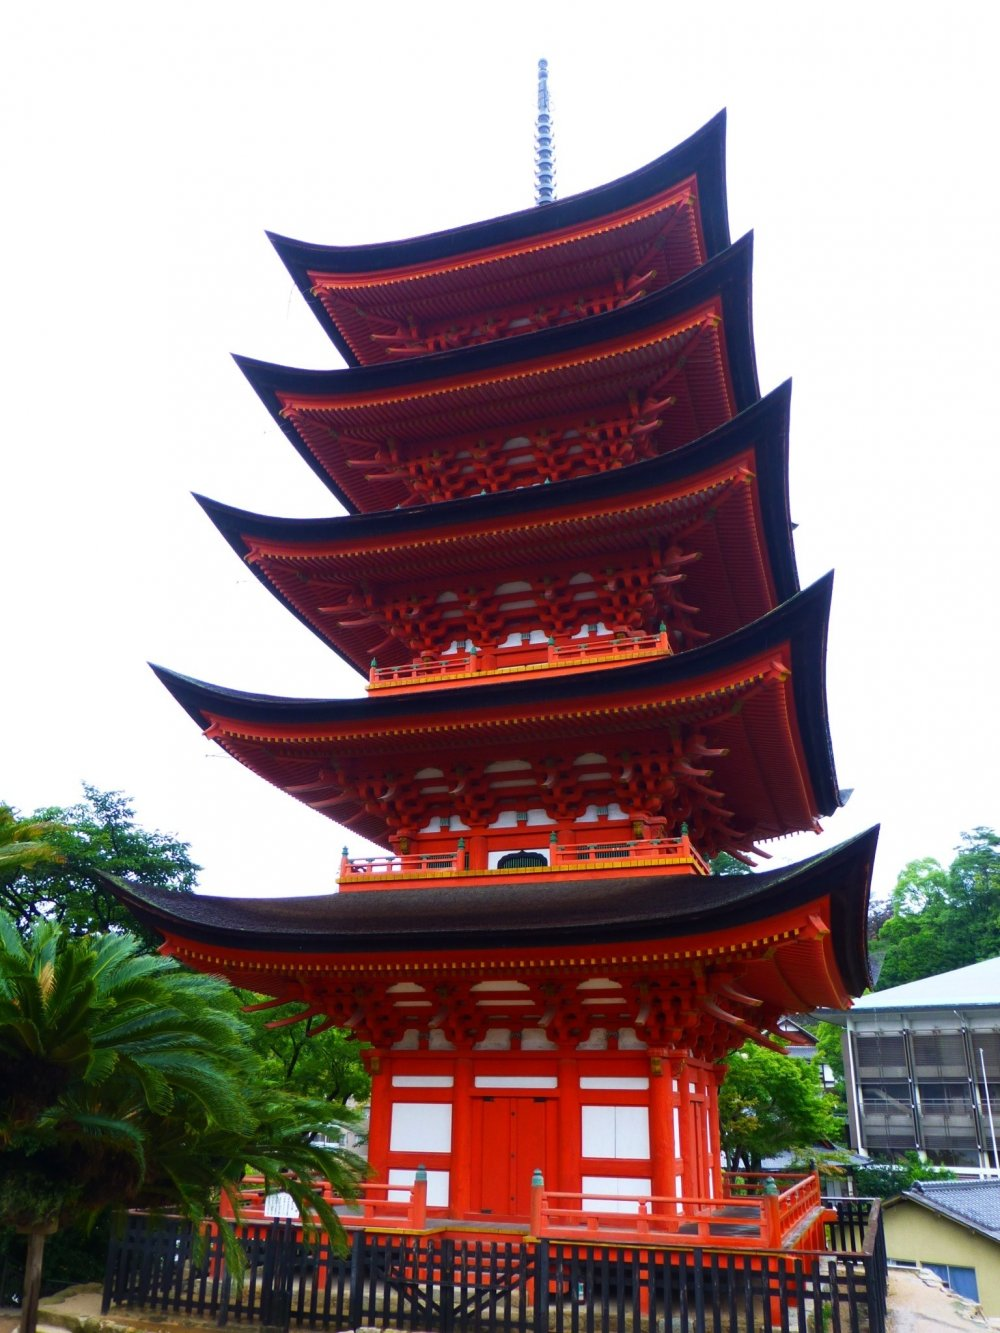 Pagoda Landscape Lighting Kits : Pagoda landscape lighting kits honshu island japan